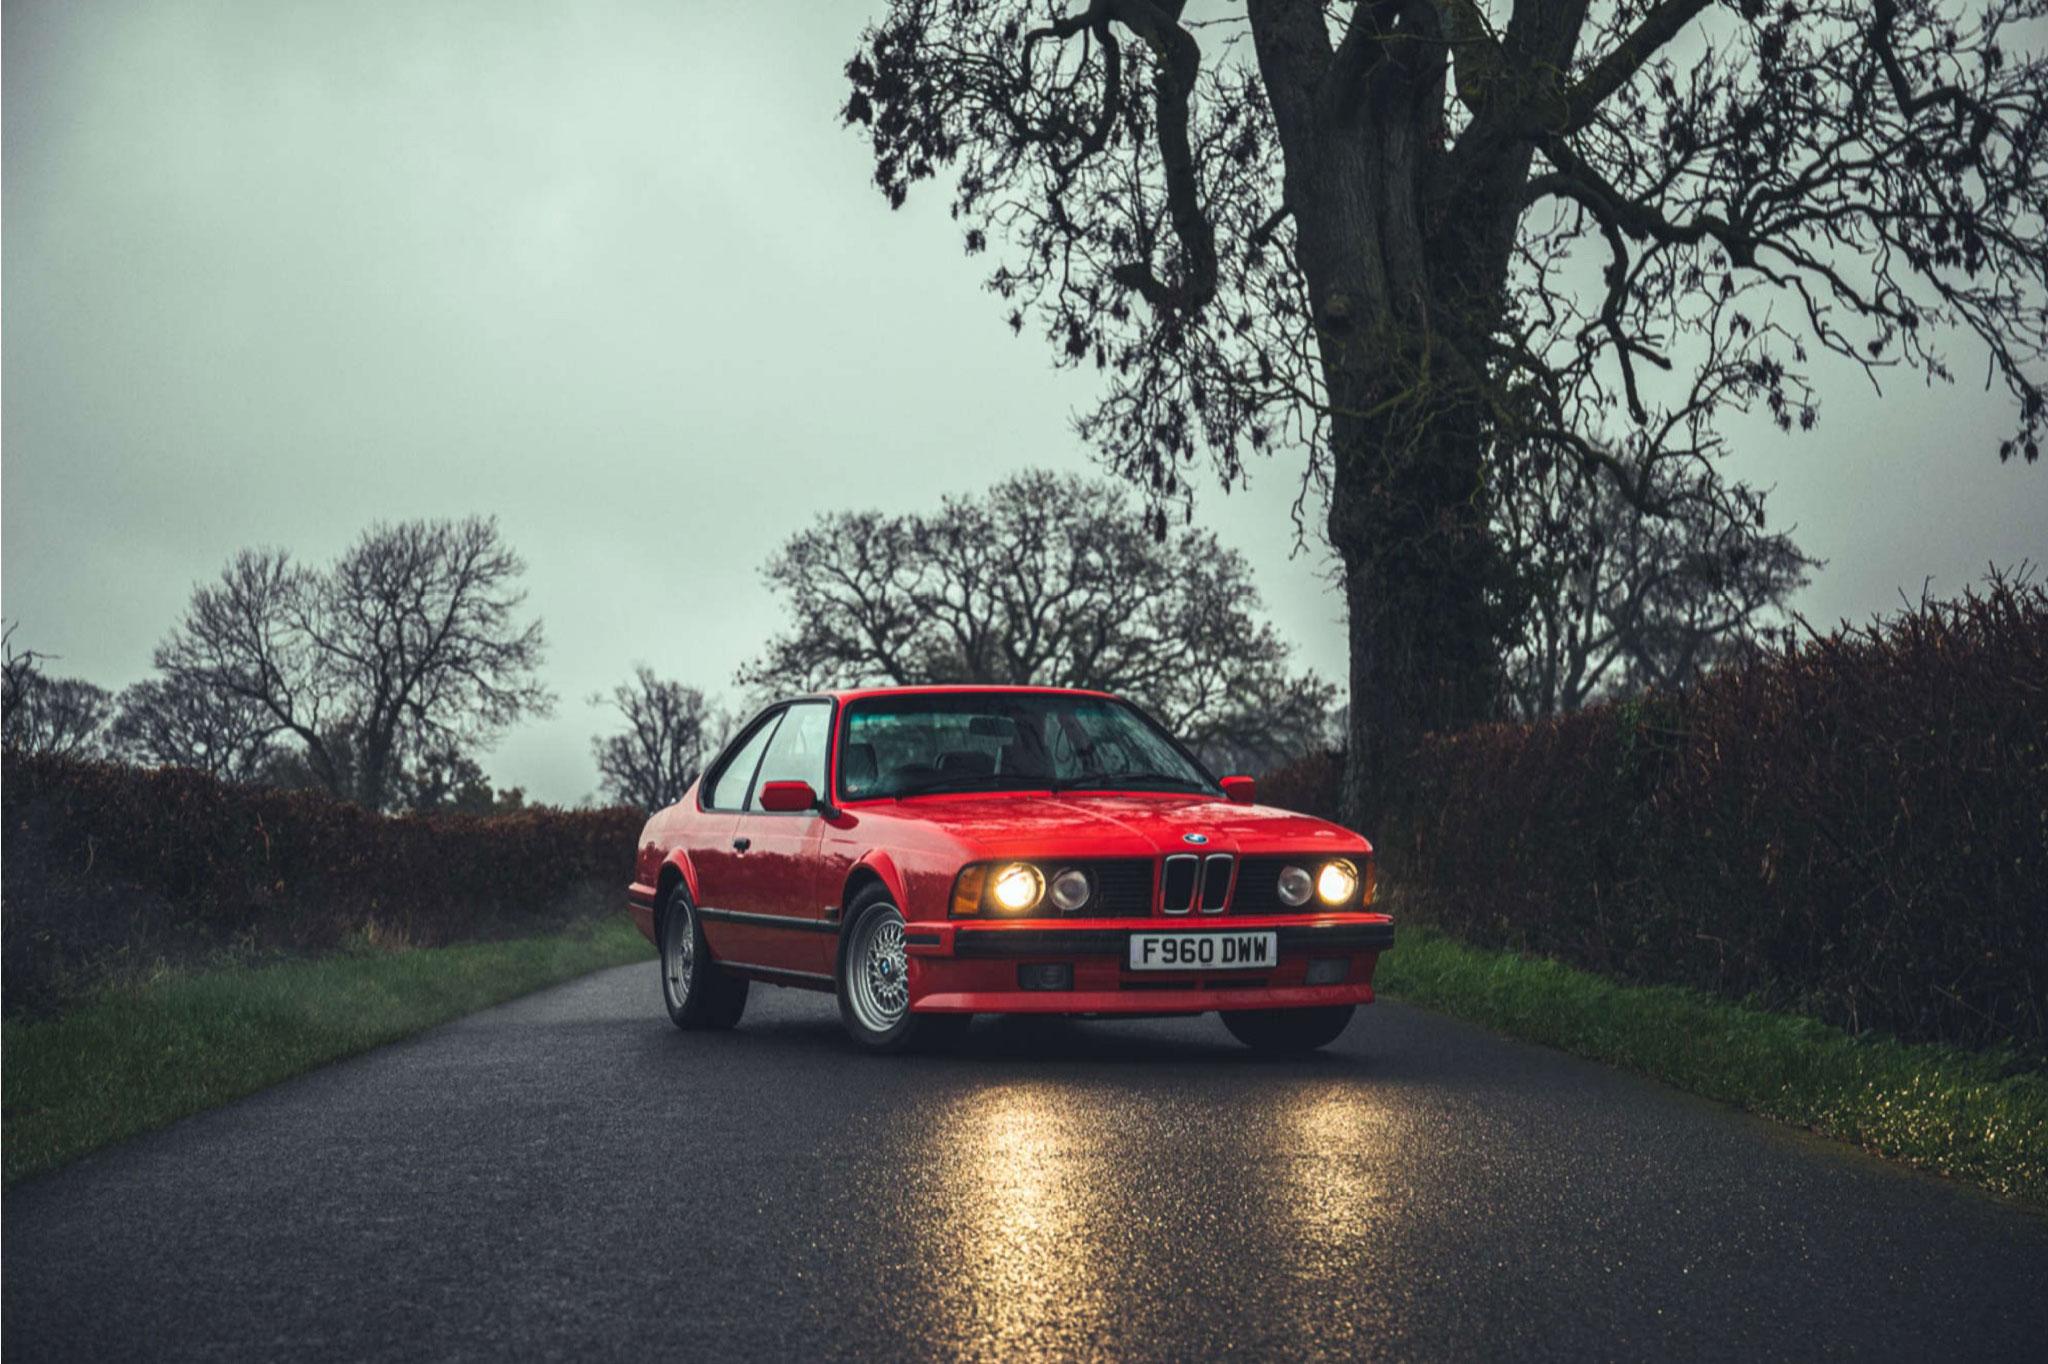 1989 BMW 635 CSi Highline automatique - £47,250 - Silverstone Auction mars 2021.